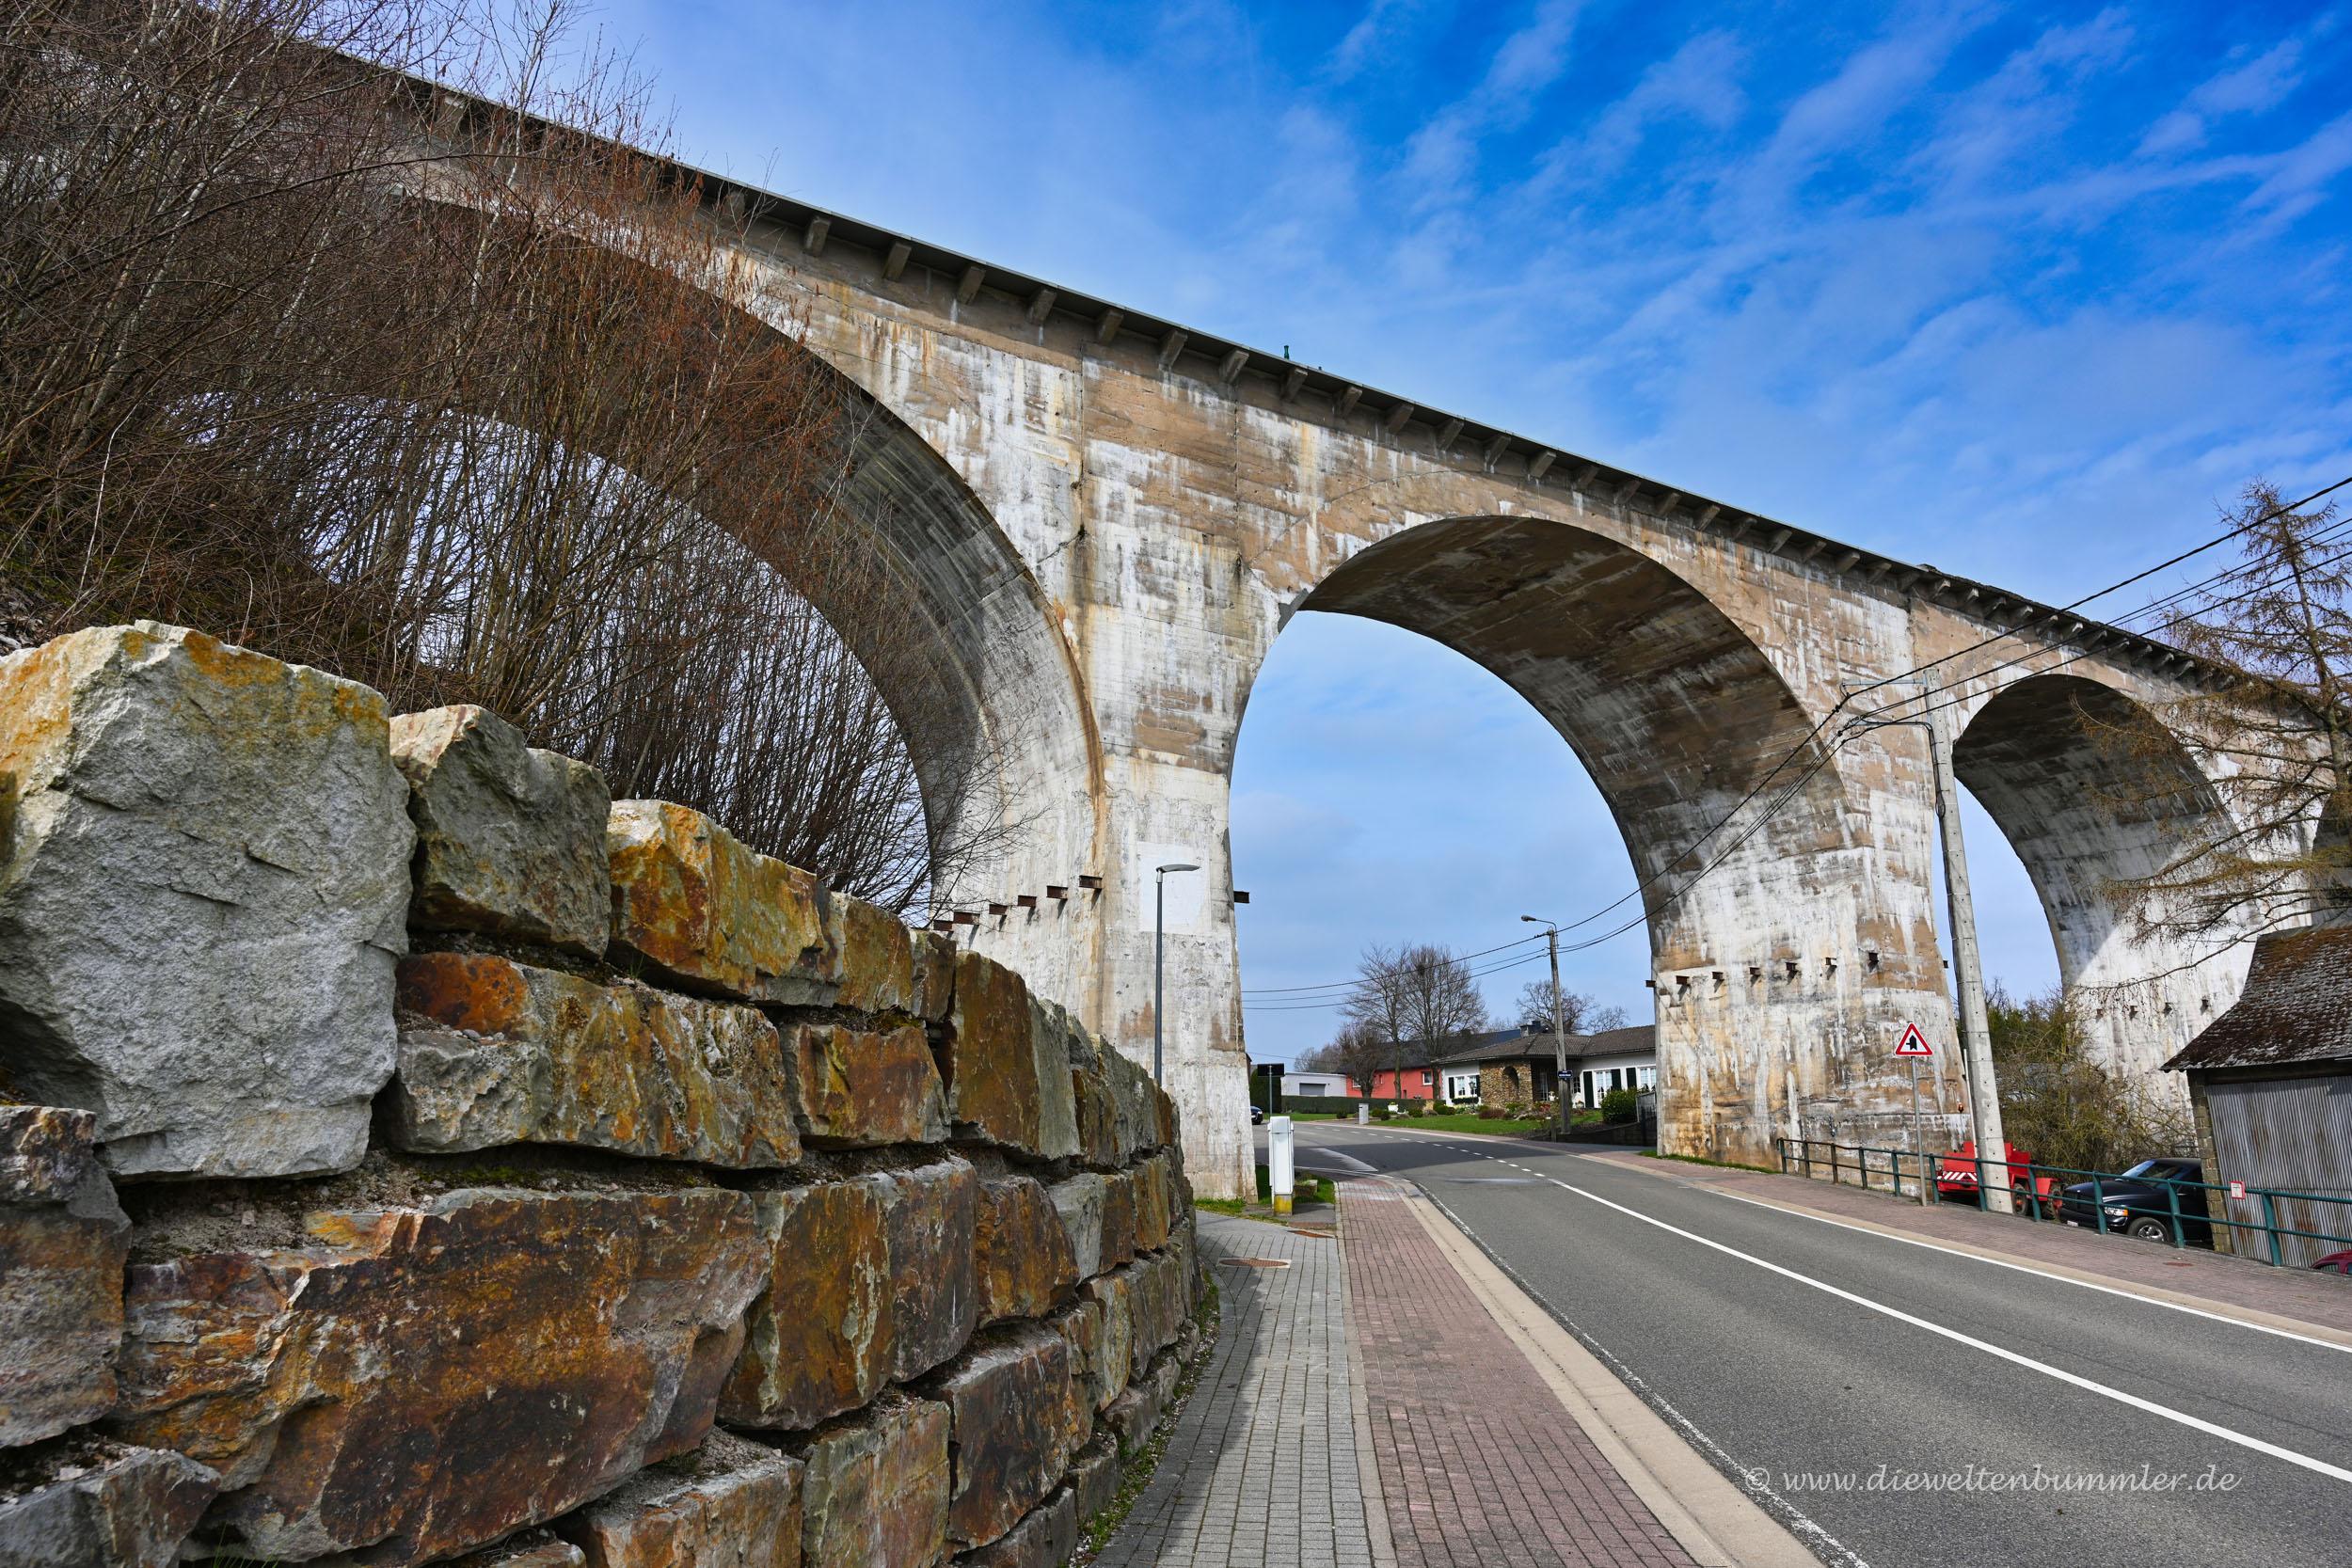 Viadukt in Belgien